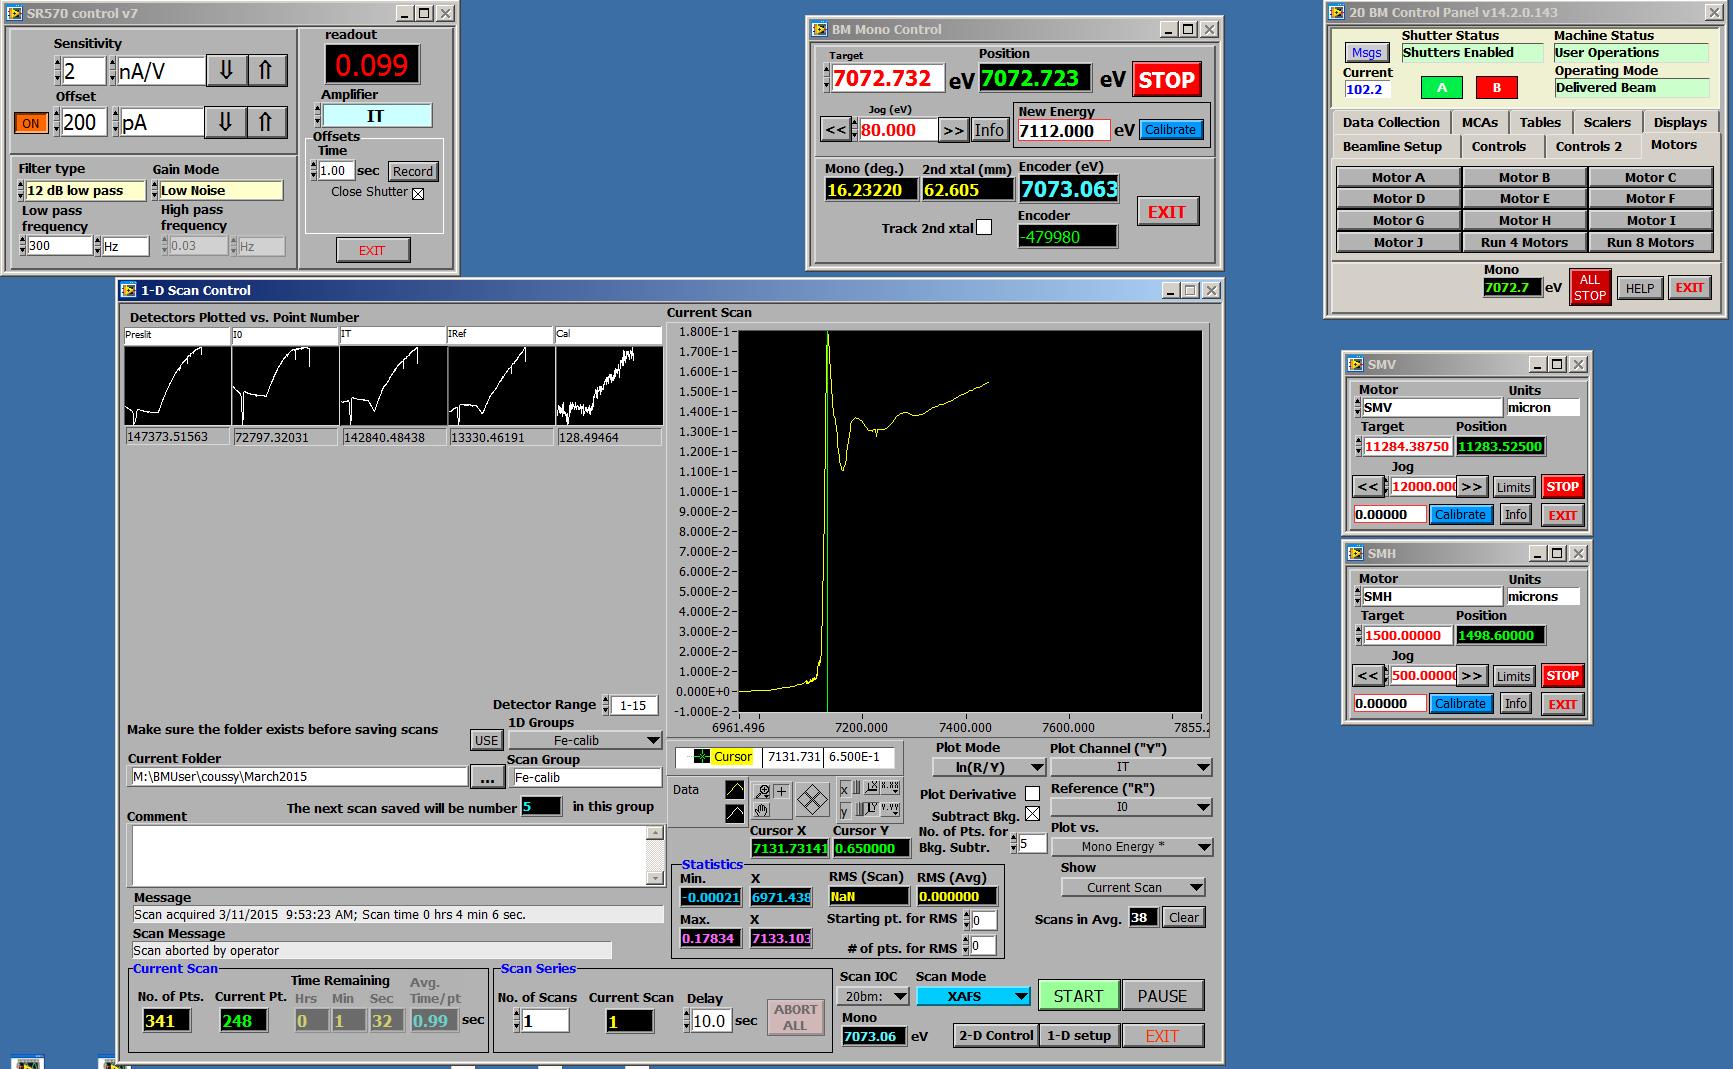 SPC control panel screen shot